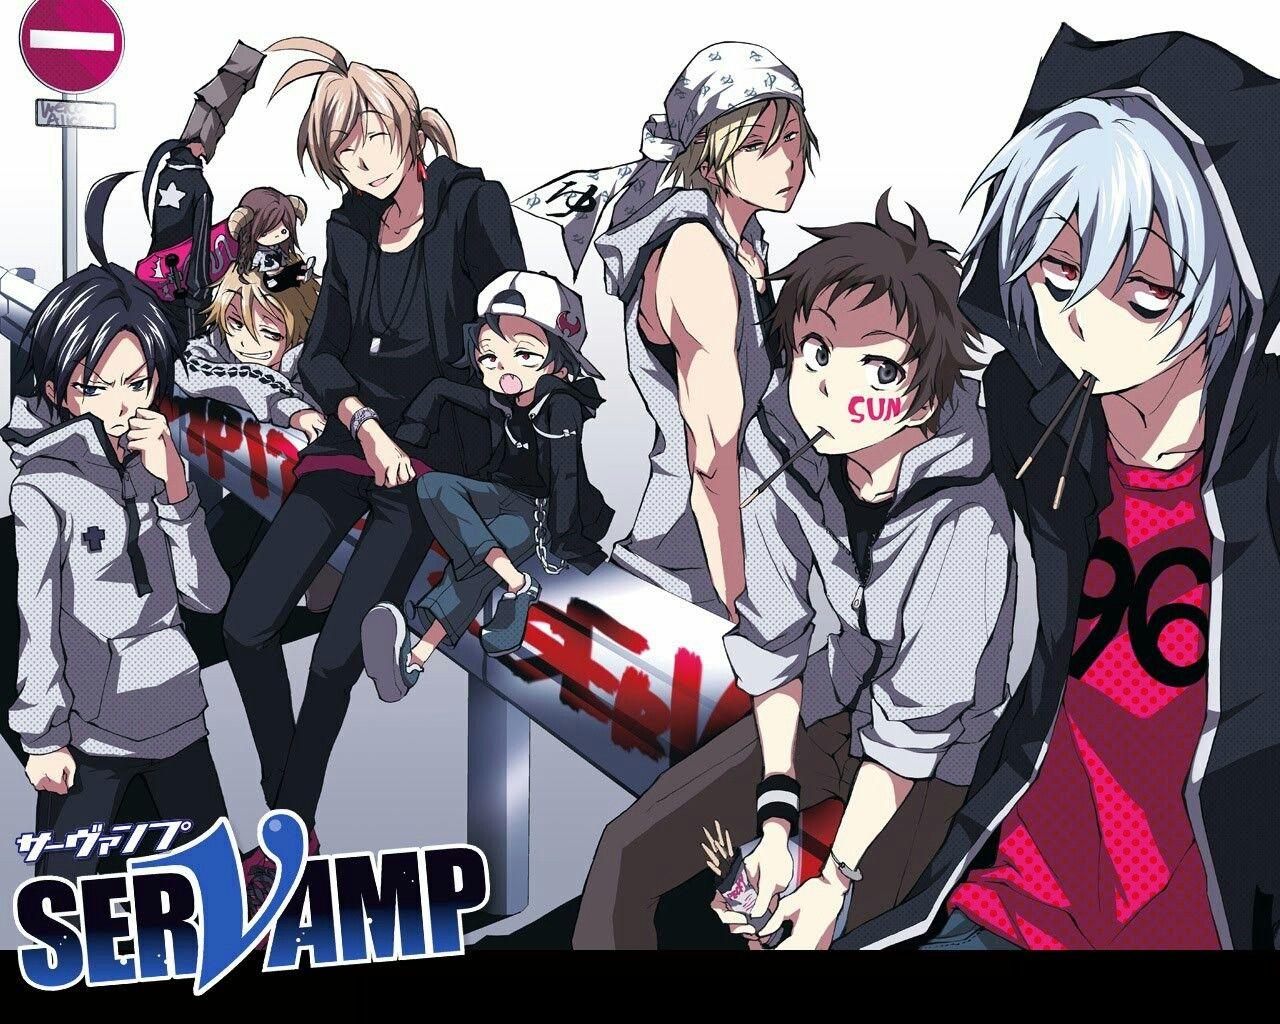 Pin by AsiA on Servamp Anime, Manga anime, Anime characters